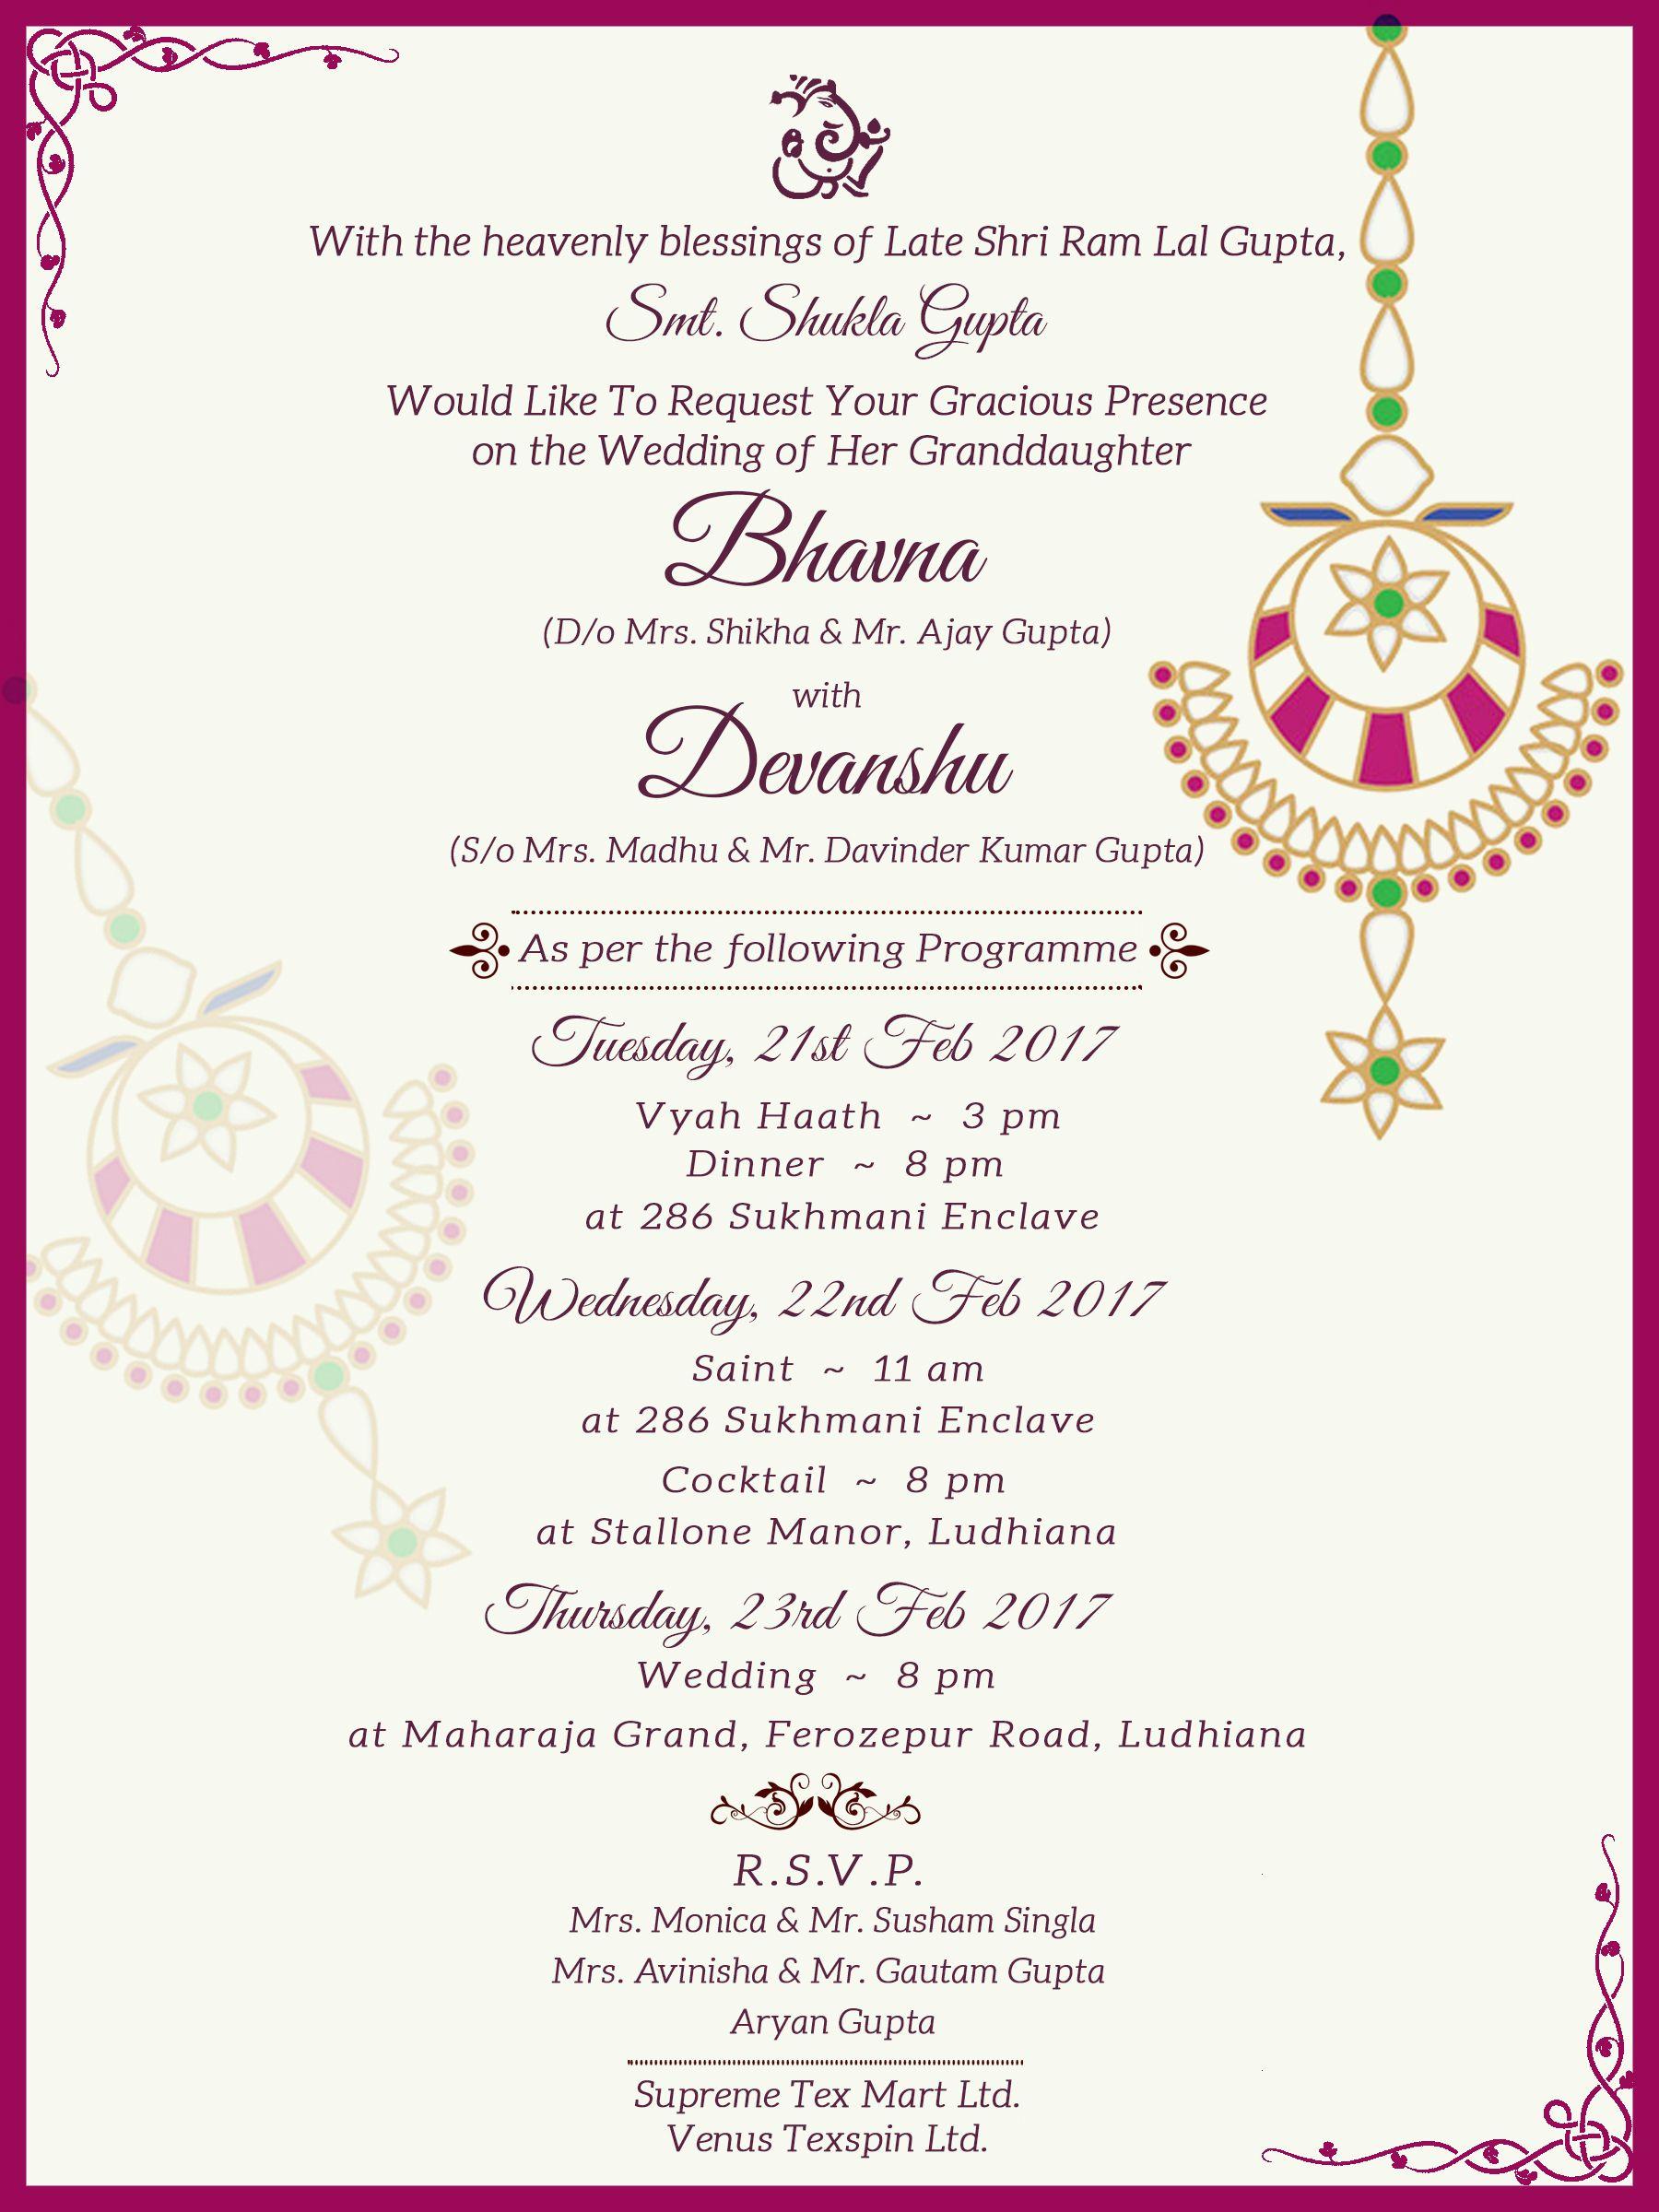 Digital Invites E Cards Invites Invitation Cards Wedding Invite Wedding Invitation Video Simple Wedding Cards Creative Invitations